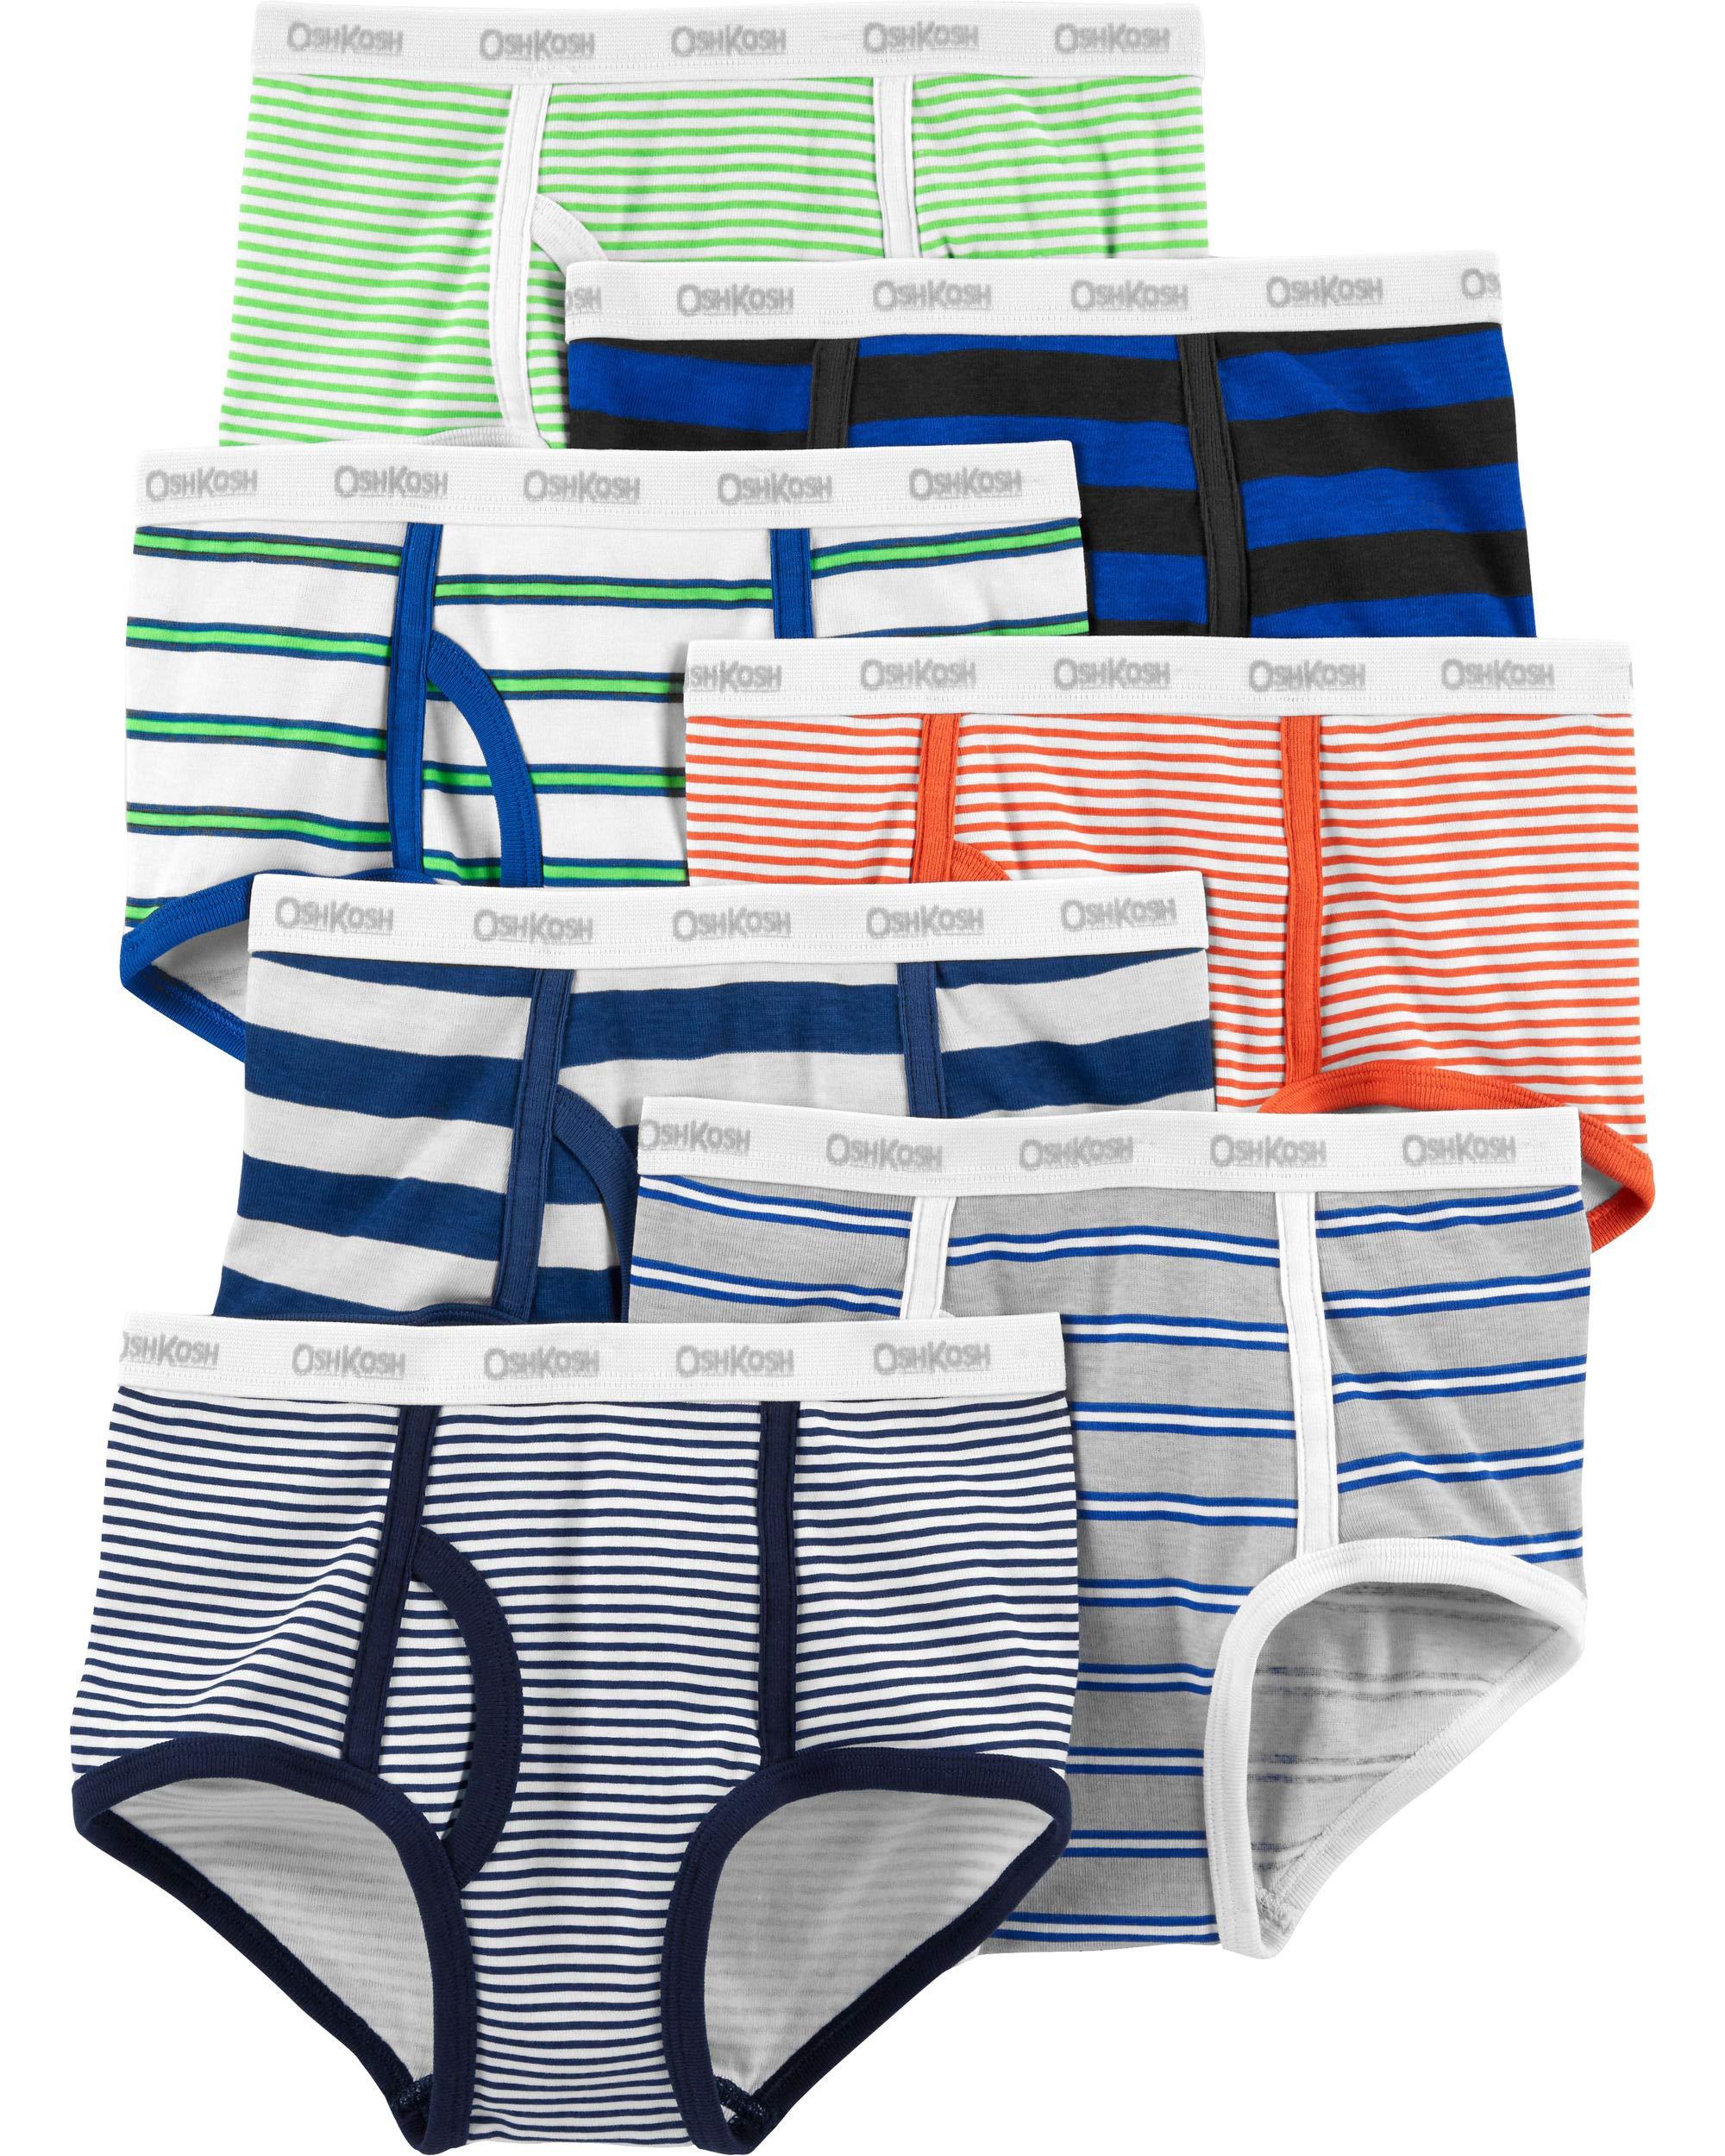 Carter's Big Boys' 7-Pack Cotton Briefs (4-5T, Rainbow Stripes(35183011)/Orange/Green)